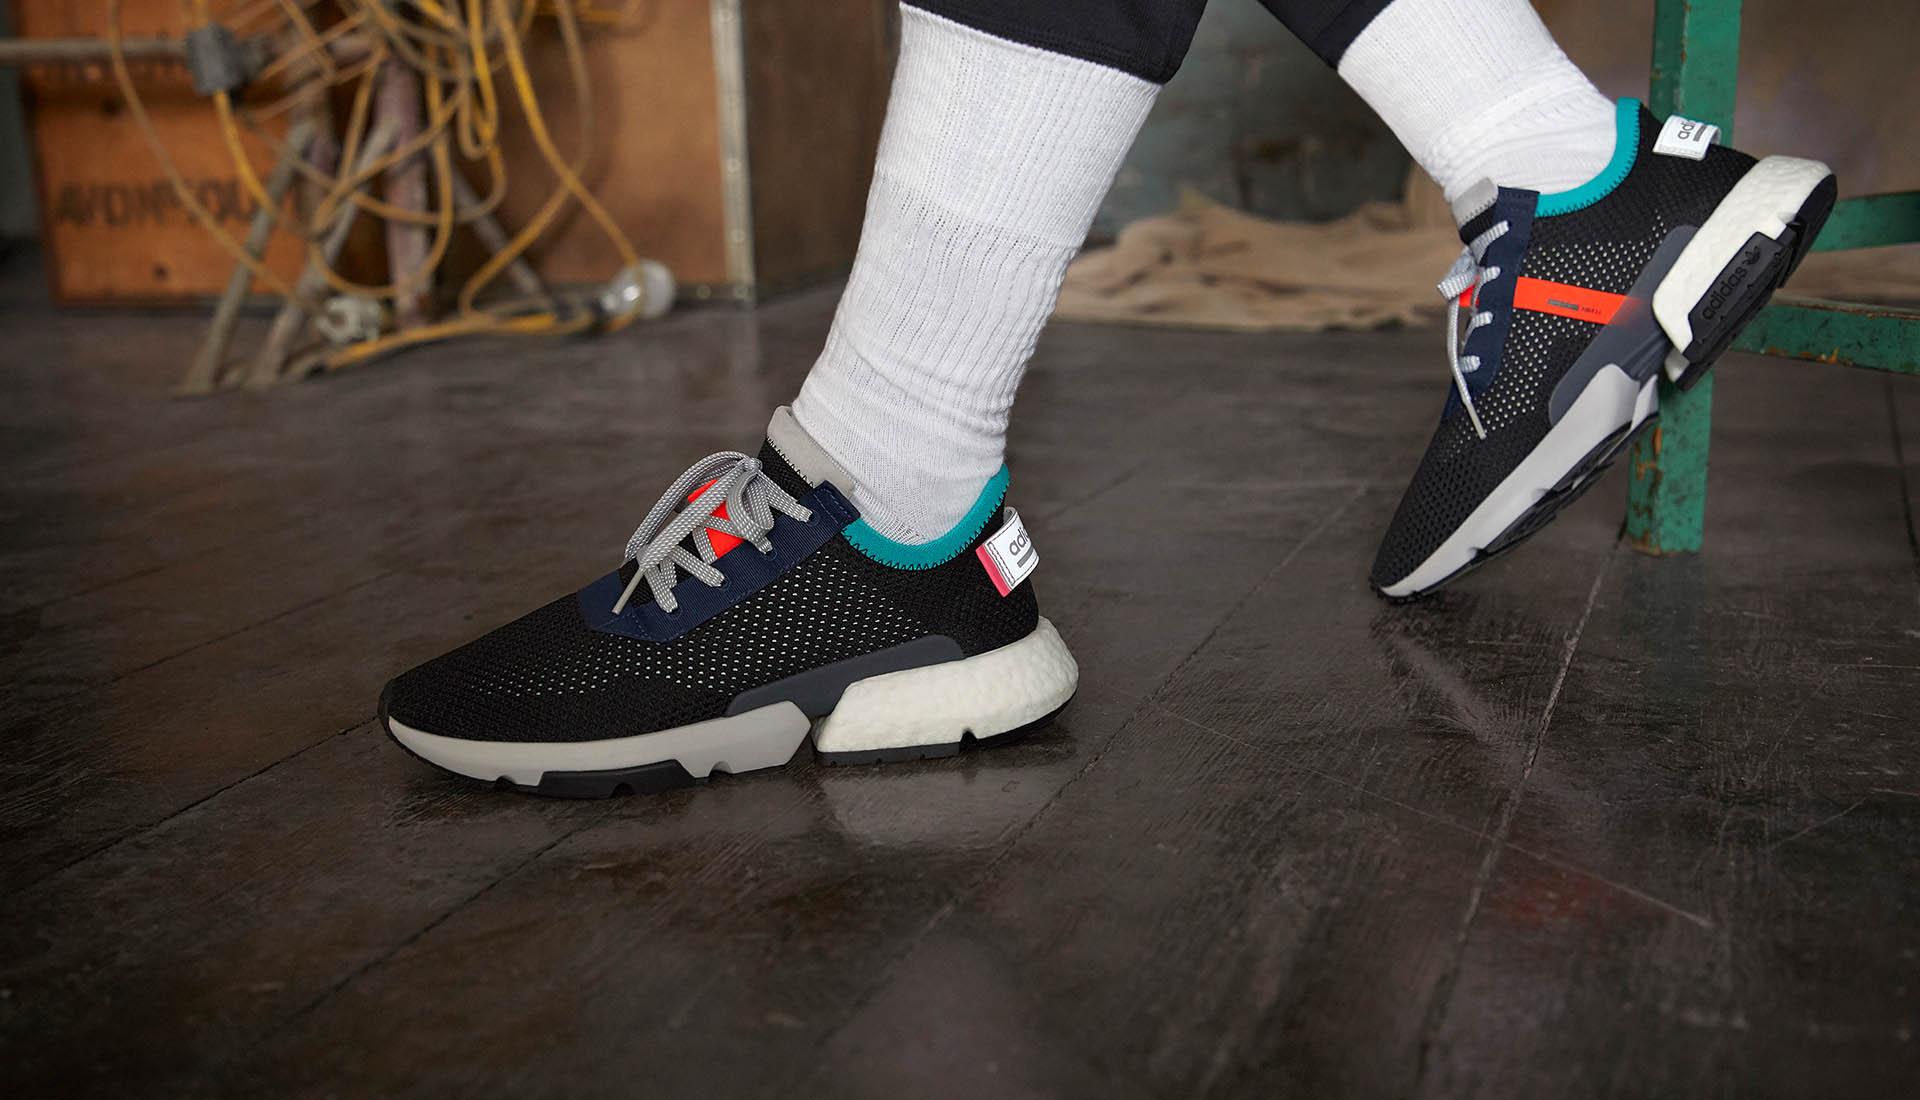 0681e79a580 Ben je direct enthousiast over deze vette Pogba X adidas Originals P.O.D-S3.1  sneaker? Bestel het exclusief in deze SHOP!